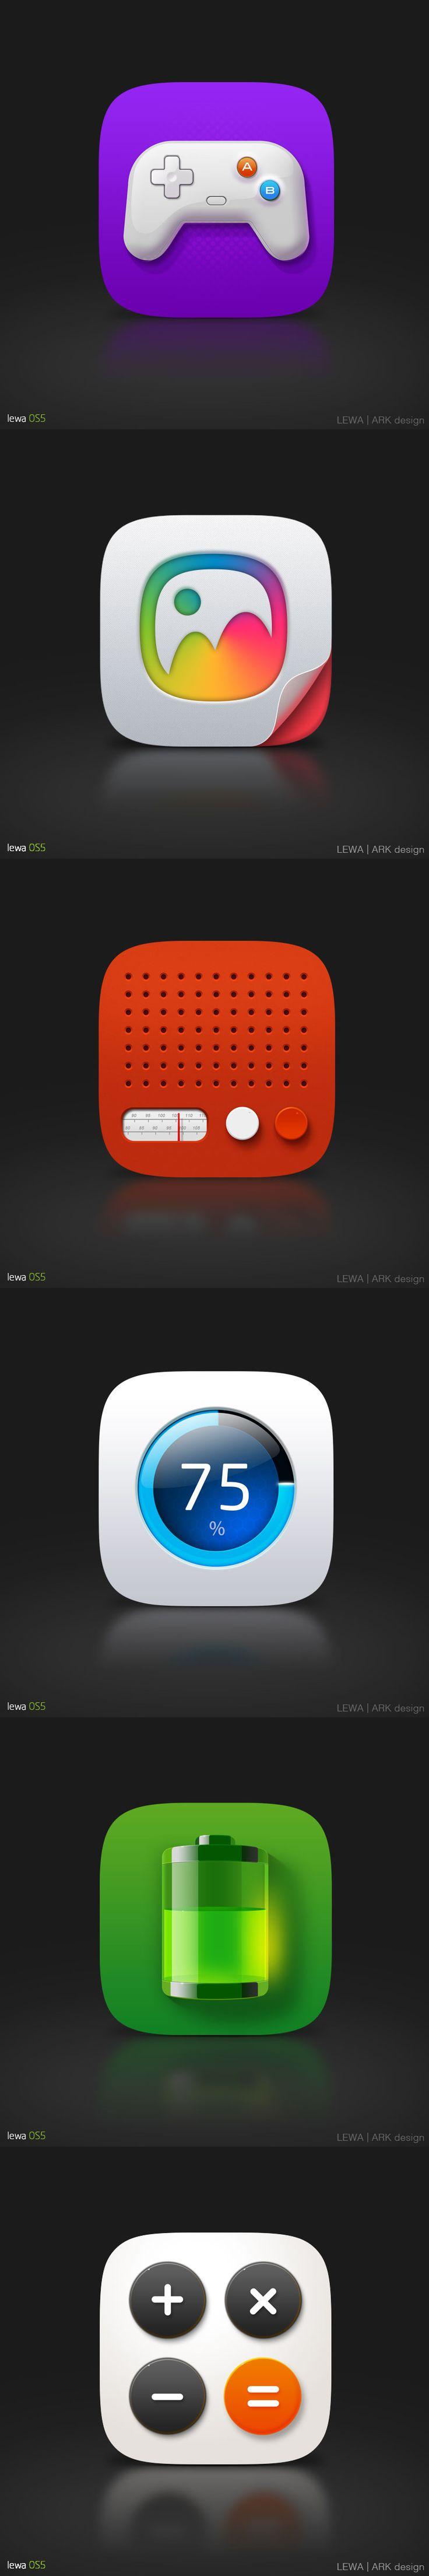 Lewa OS5 icon by Chuan²